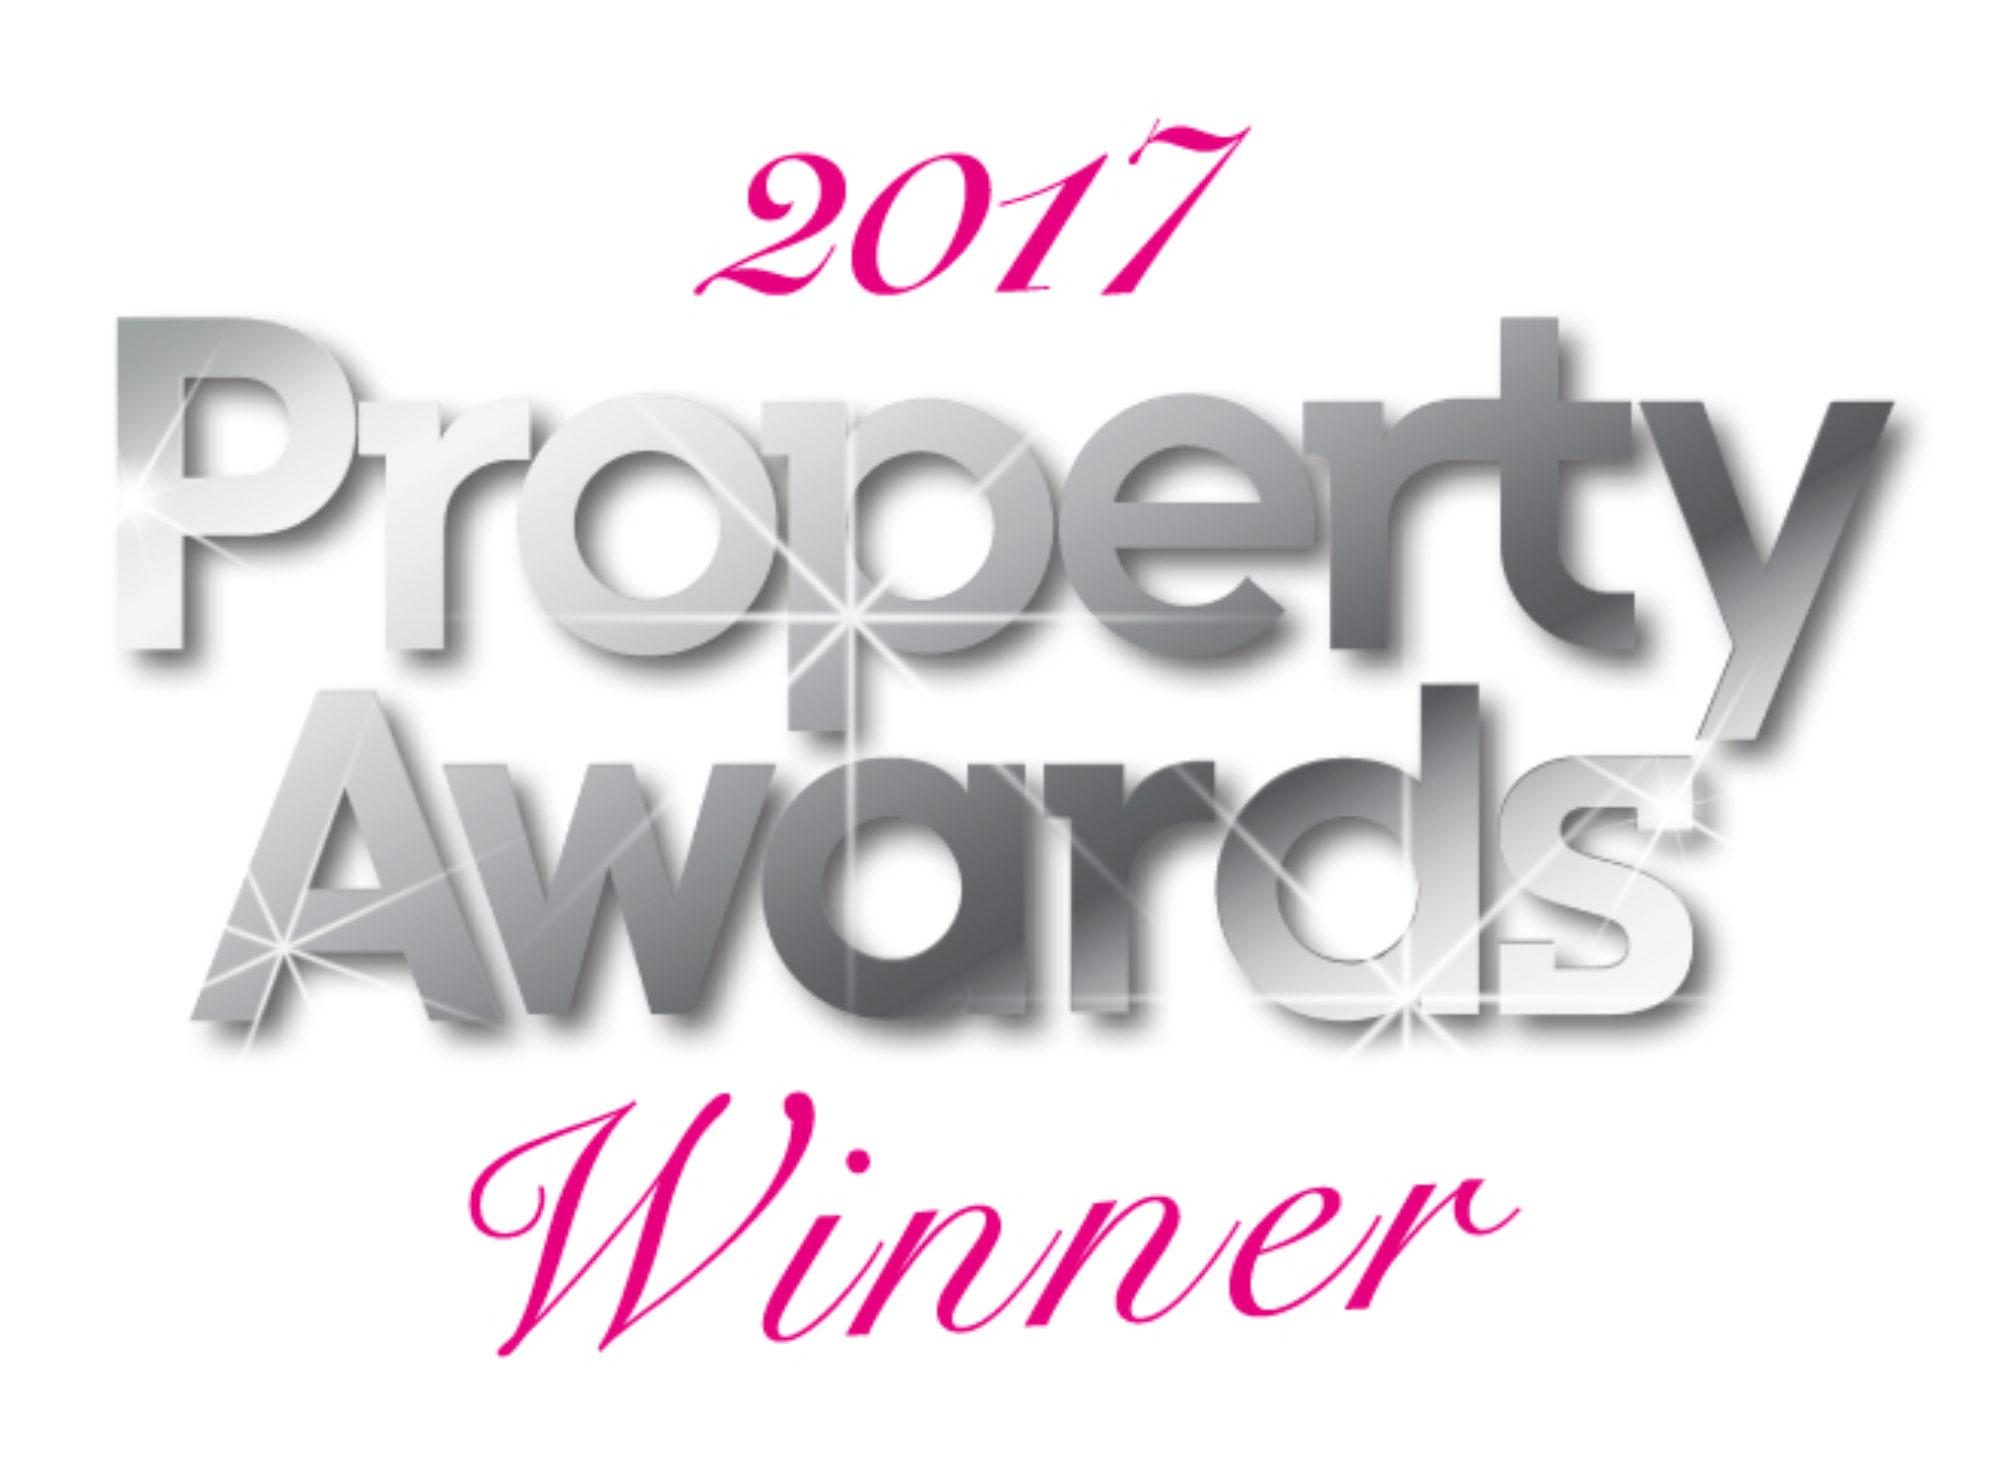 Derwent London wins Property Week Developer of the Year Award 2017